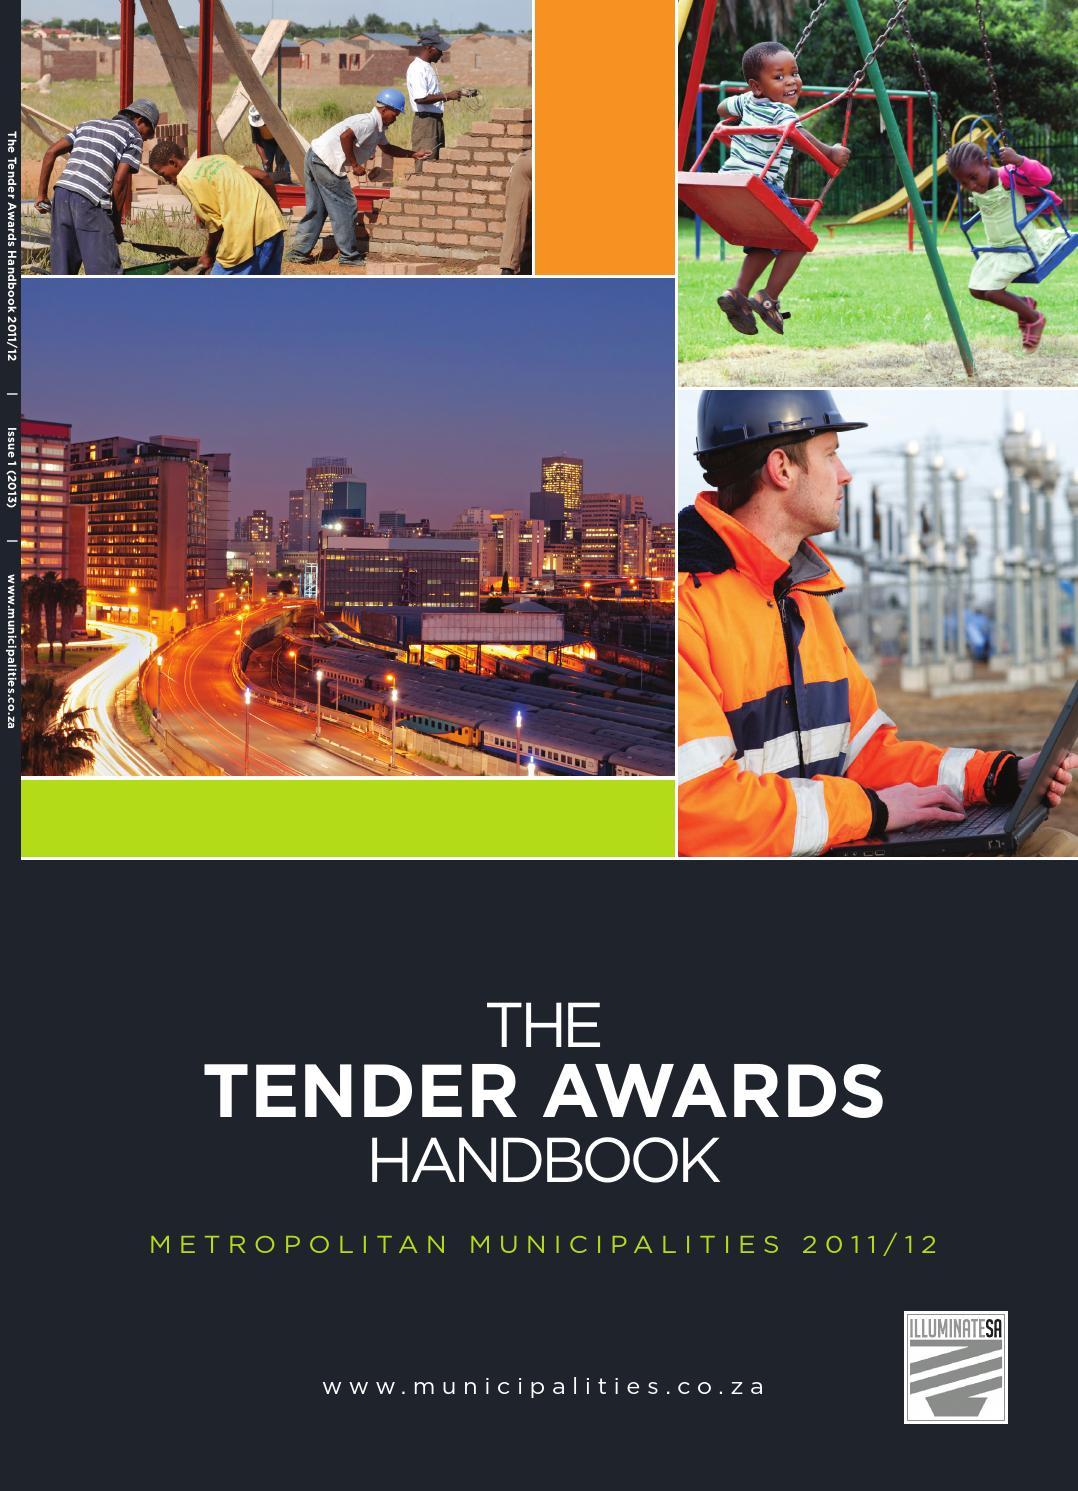 Tender Awards Handbook Metropolitan Municipalities 201112